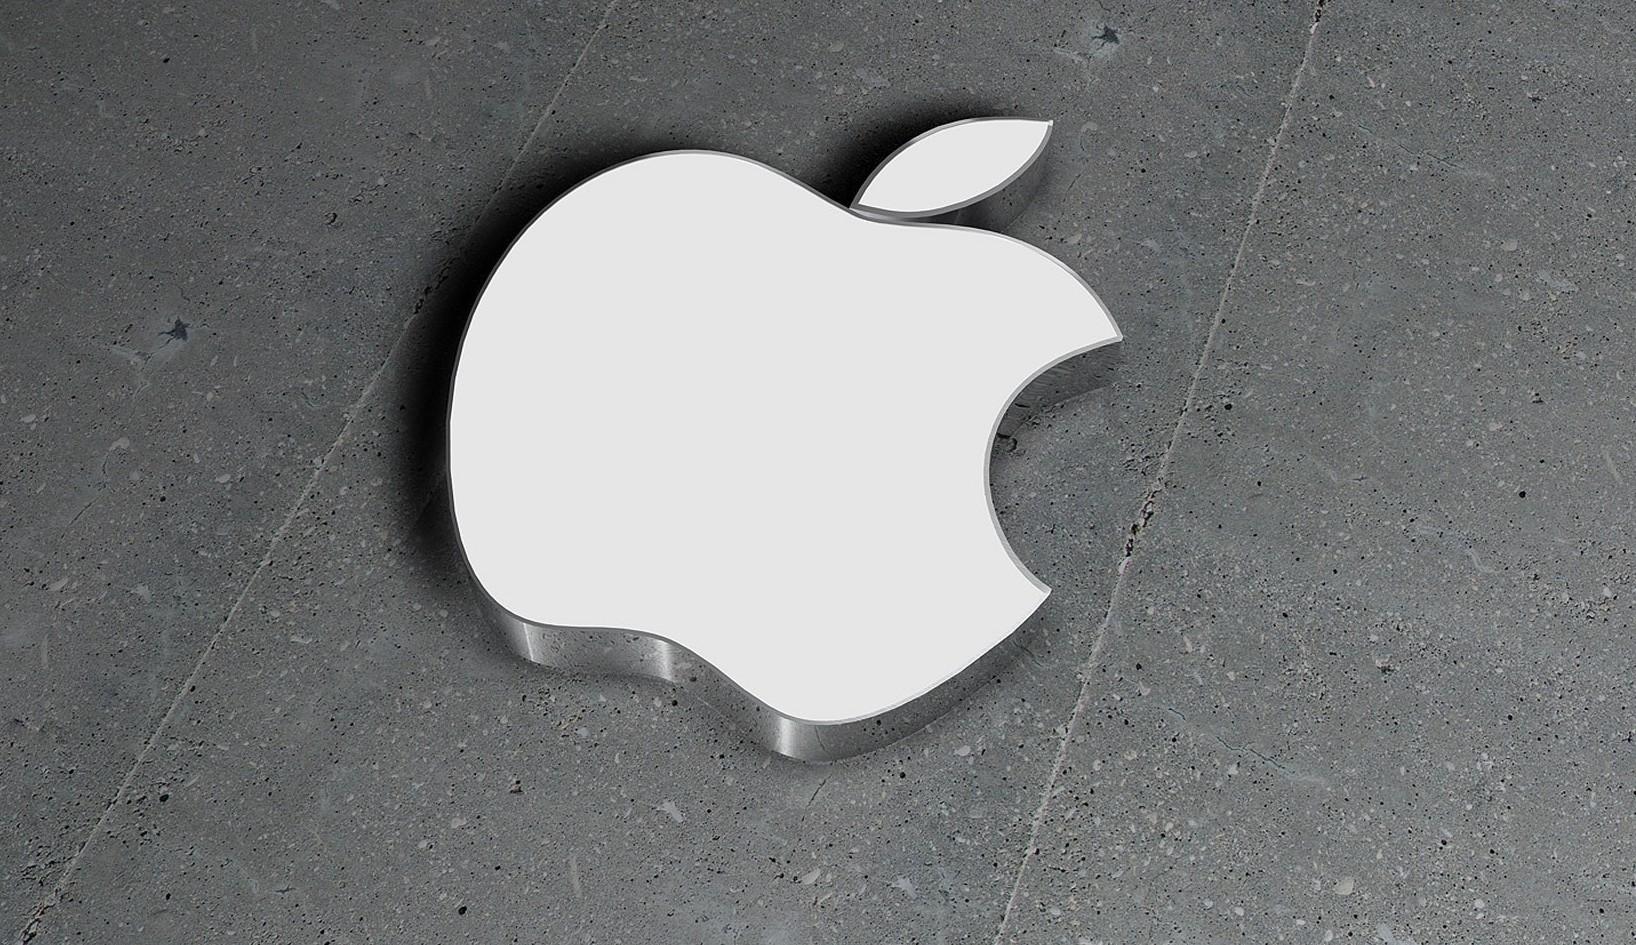 Metal Apple logo Wallpaper